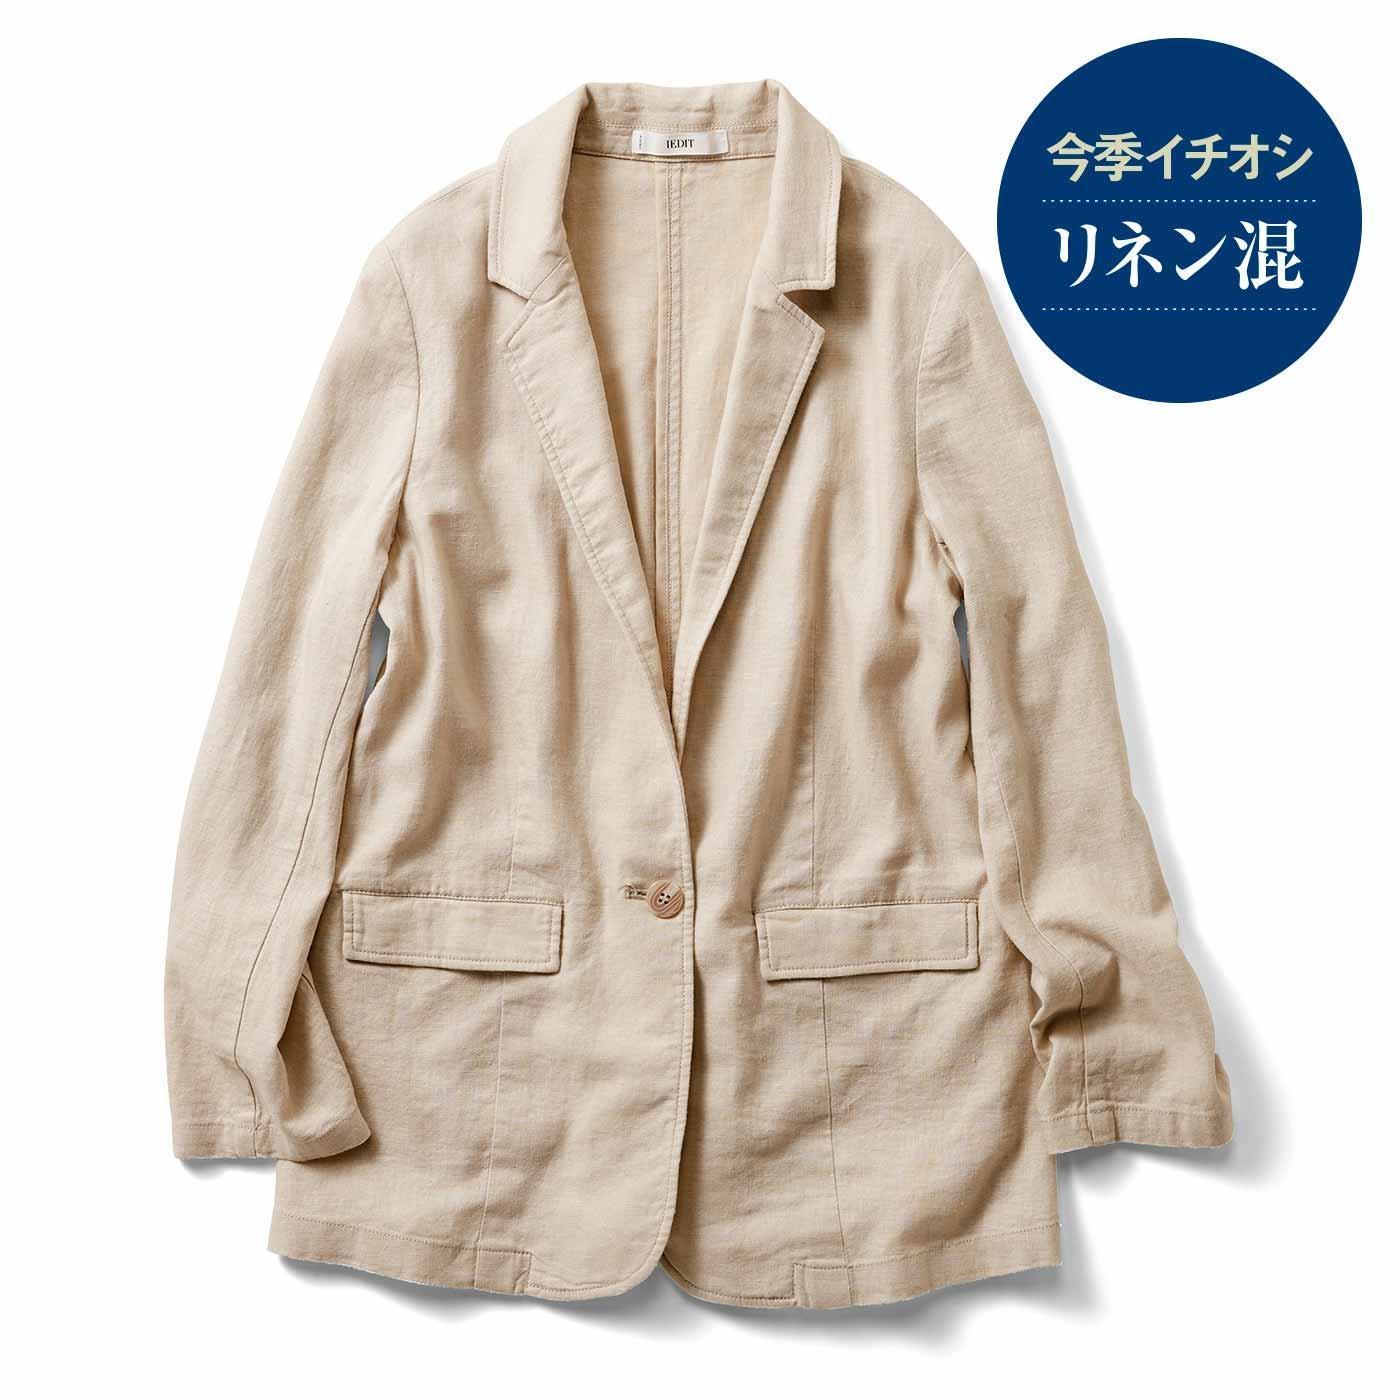 IEDIT[イディット] リネン混素材で上質にこなれる きれい見えジャケット〈ベージュ〉